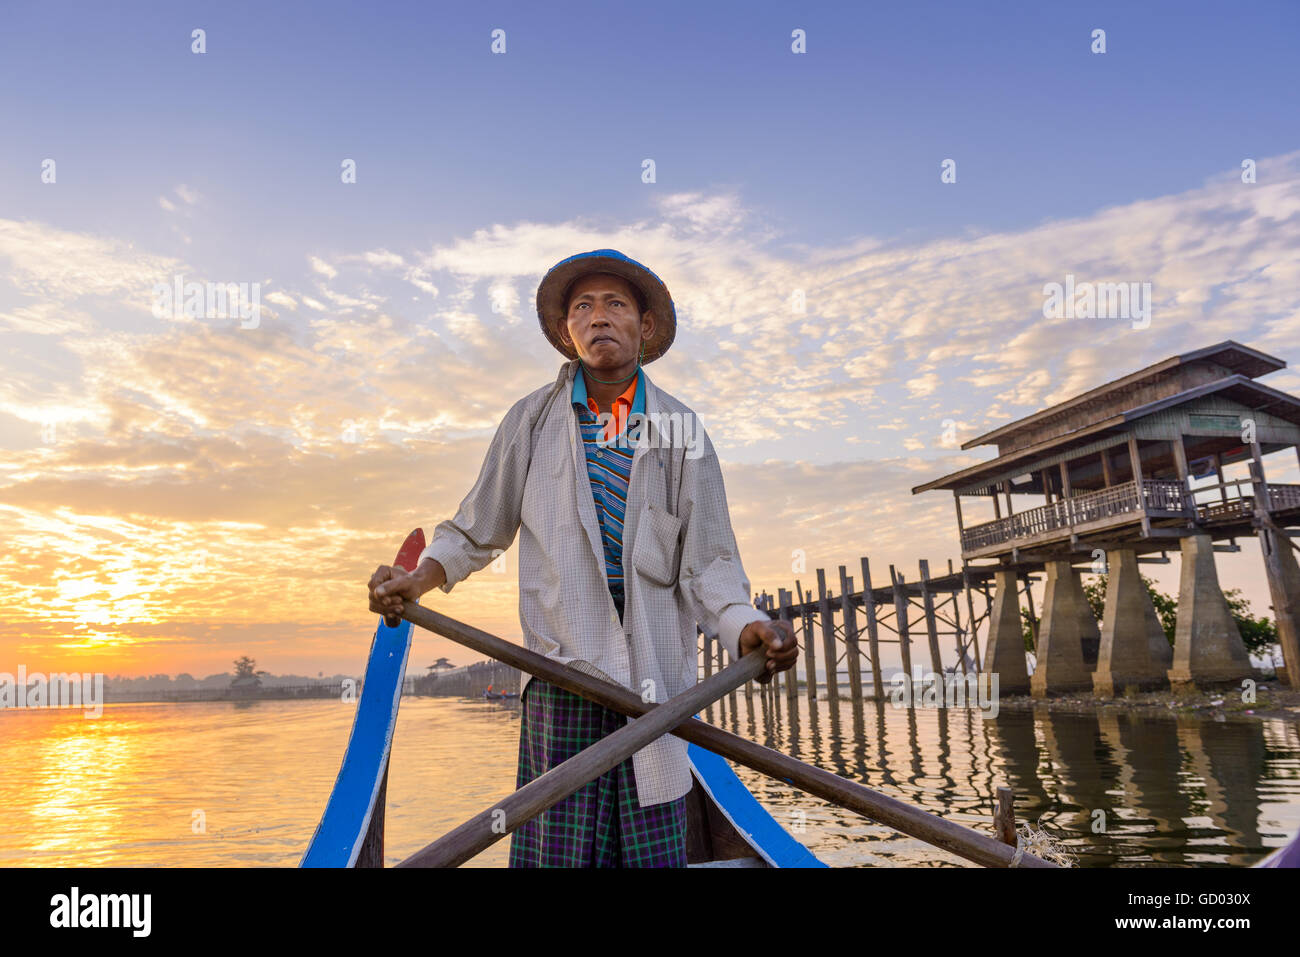 MANDALAY, MYANMAR - OCTOBER 28, 2015: A Gondolier paddles on Taungthaman Lake at U-Bein Bridge. - Stock Image